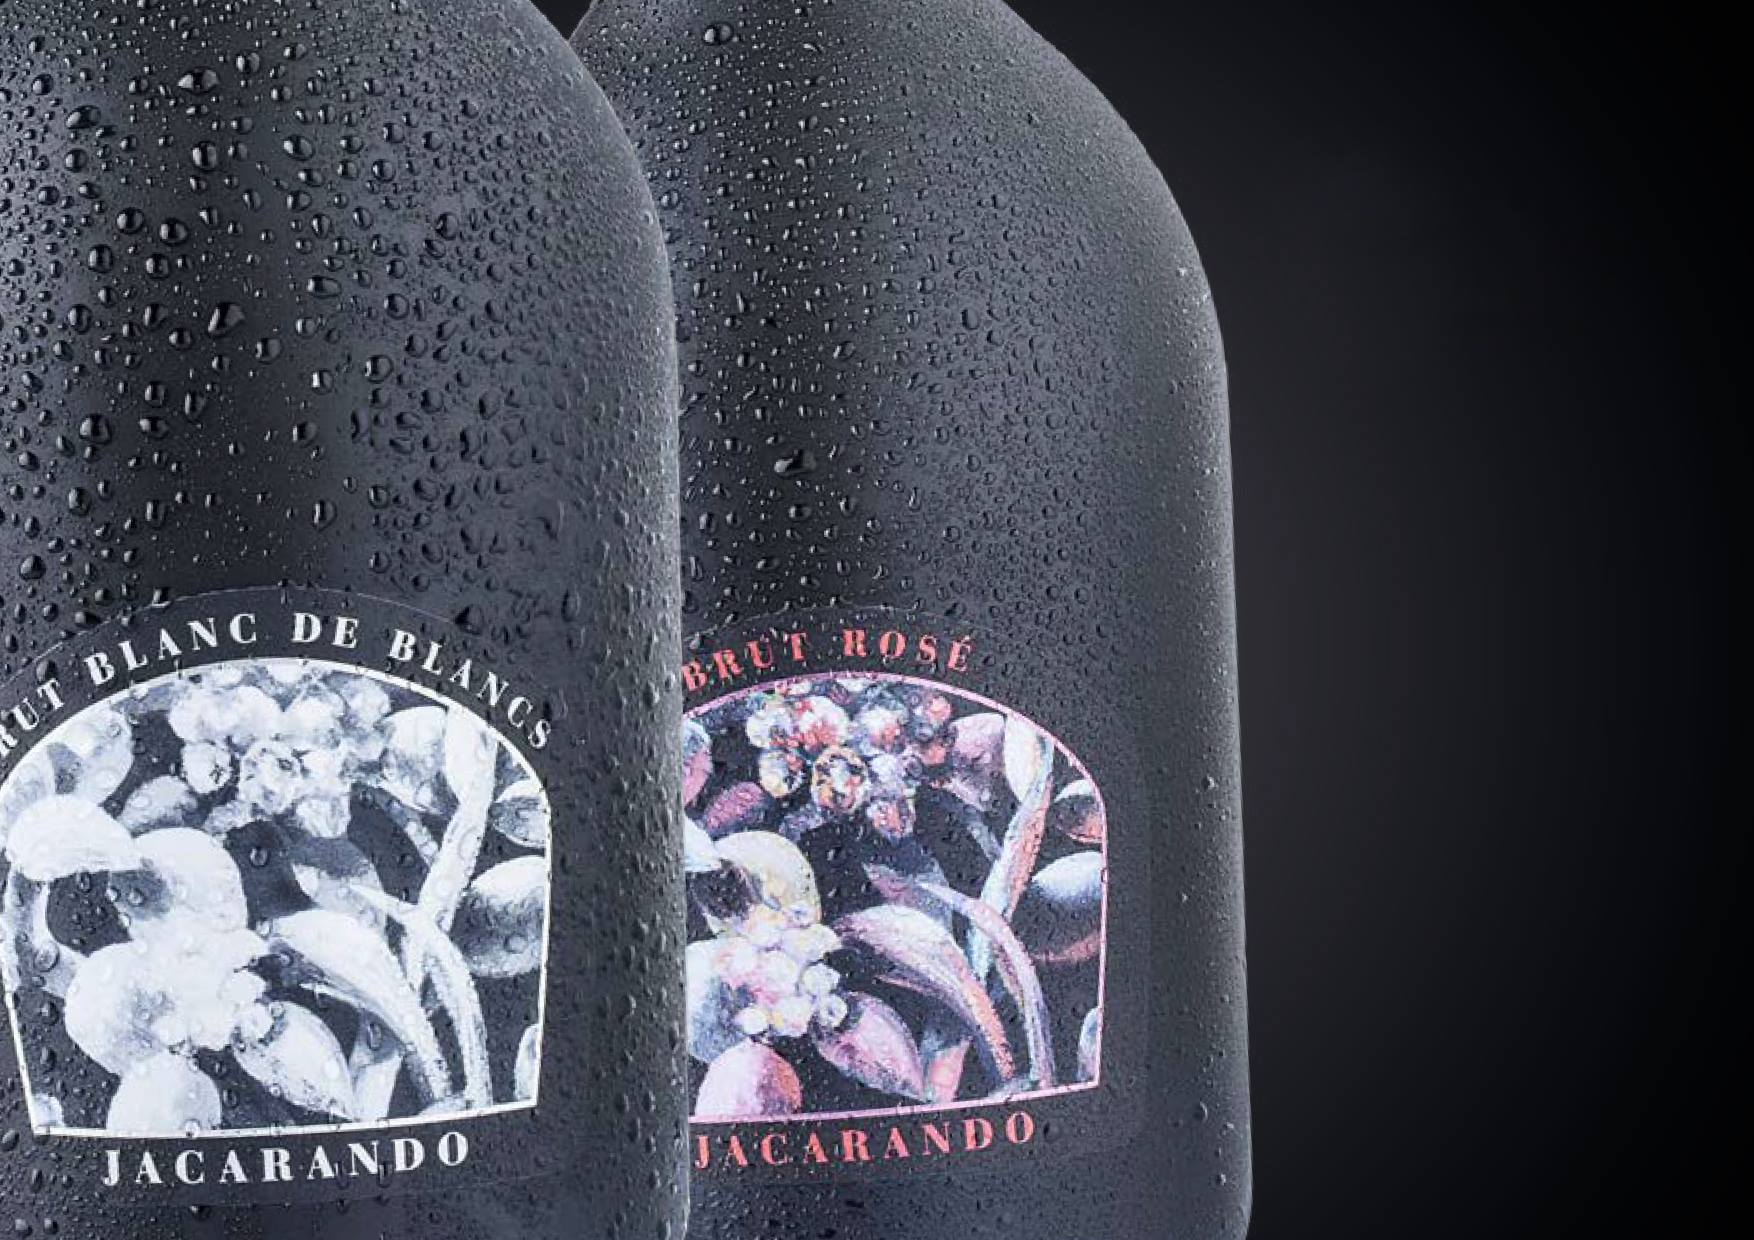 jacarando-label-02